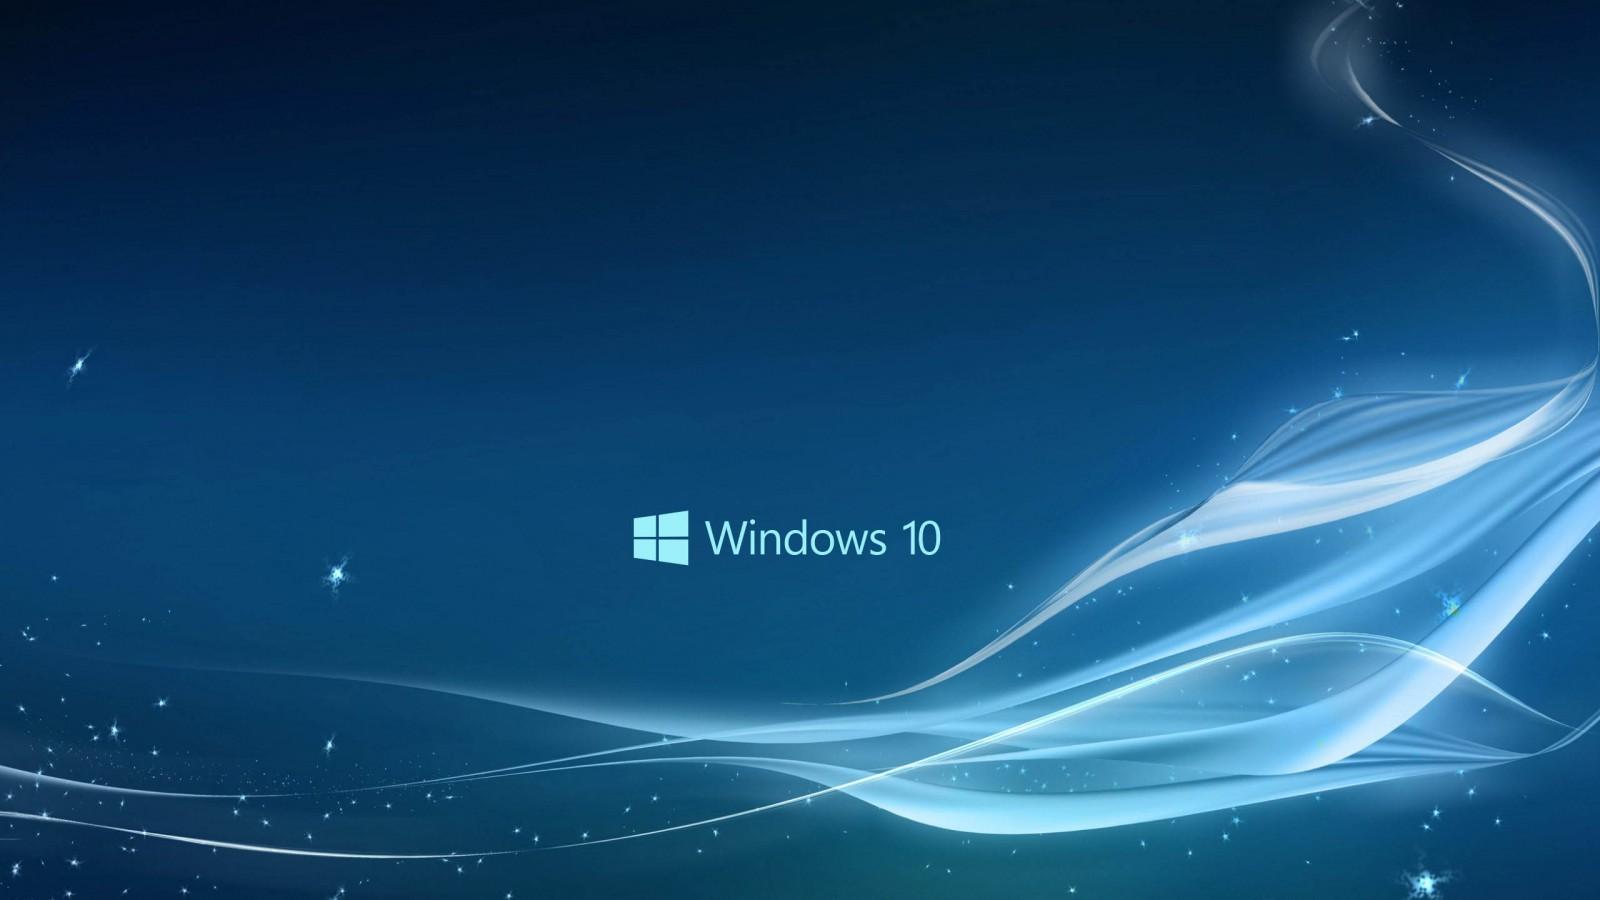 Windows 10 HD wallpaper 2015 1600x900   Wallpaper   Wallpaper Style 1600x900